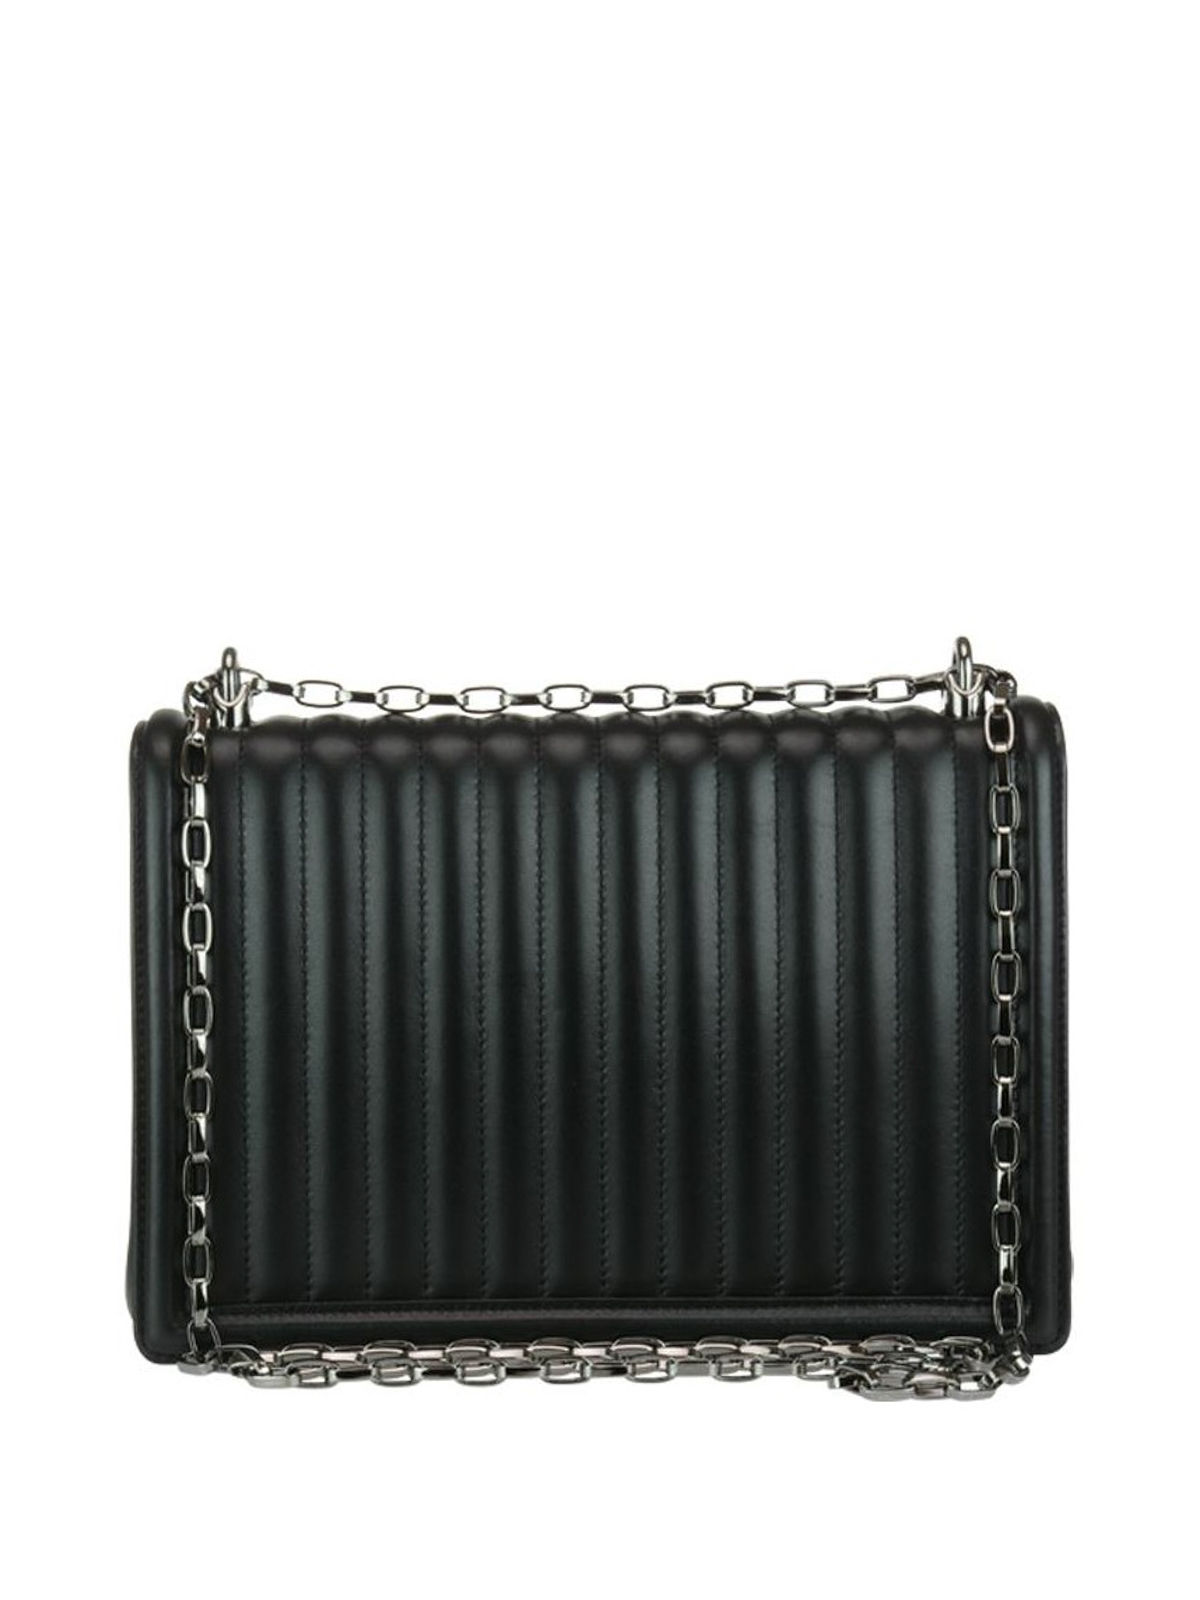 Dolce & Gabbana DG Girls matelasse nappa bag PL2xHpWle